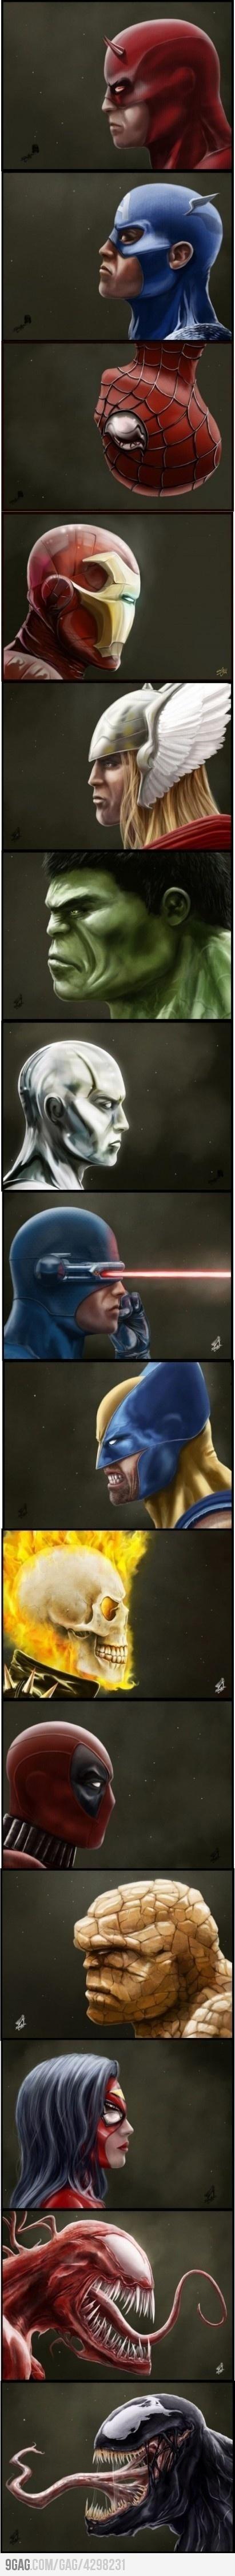 Best Marvel Superheros